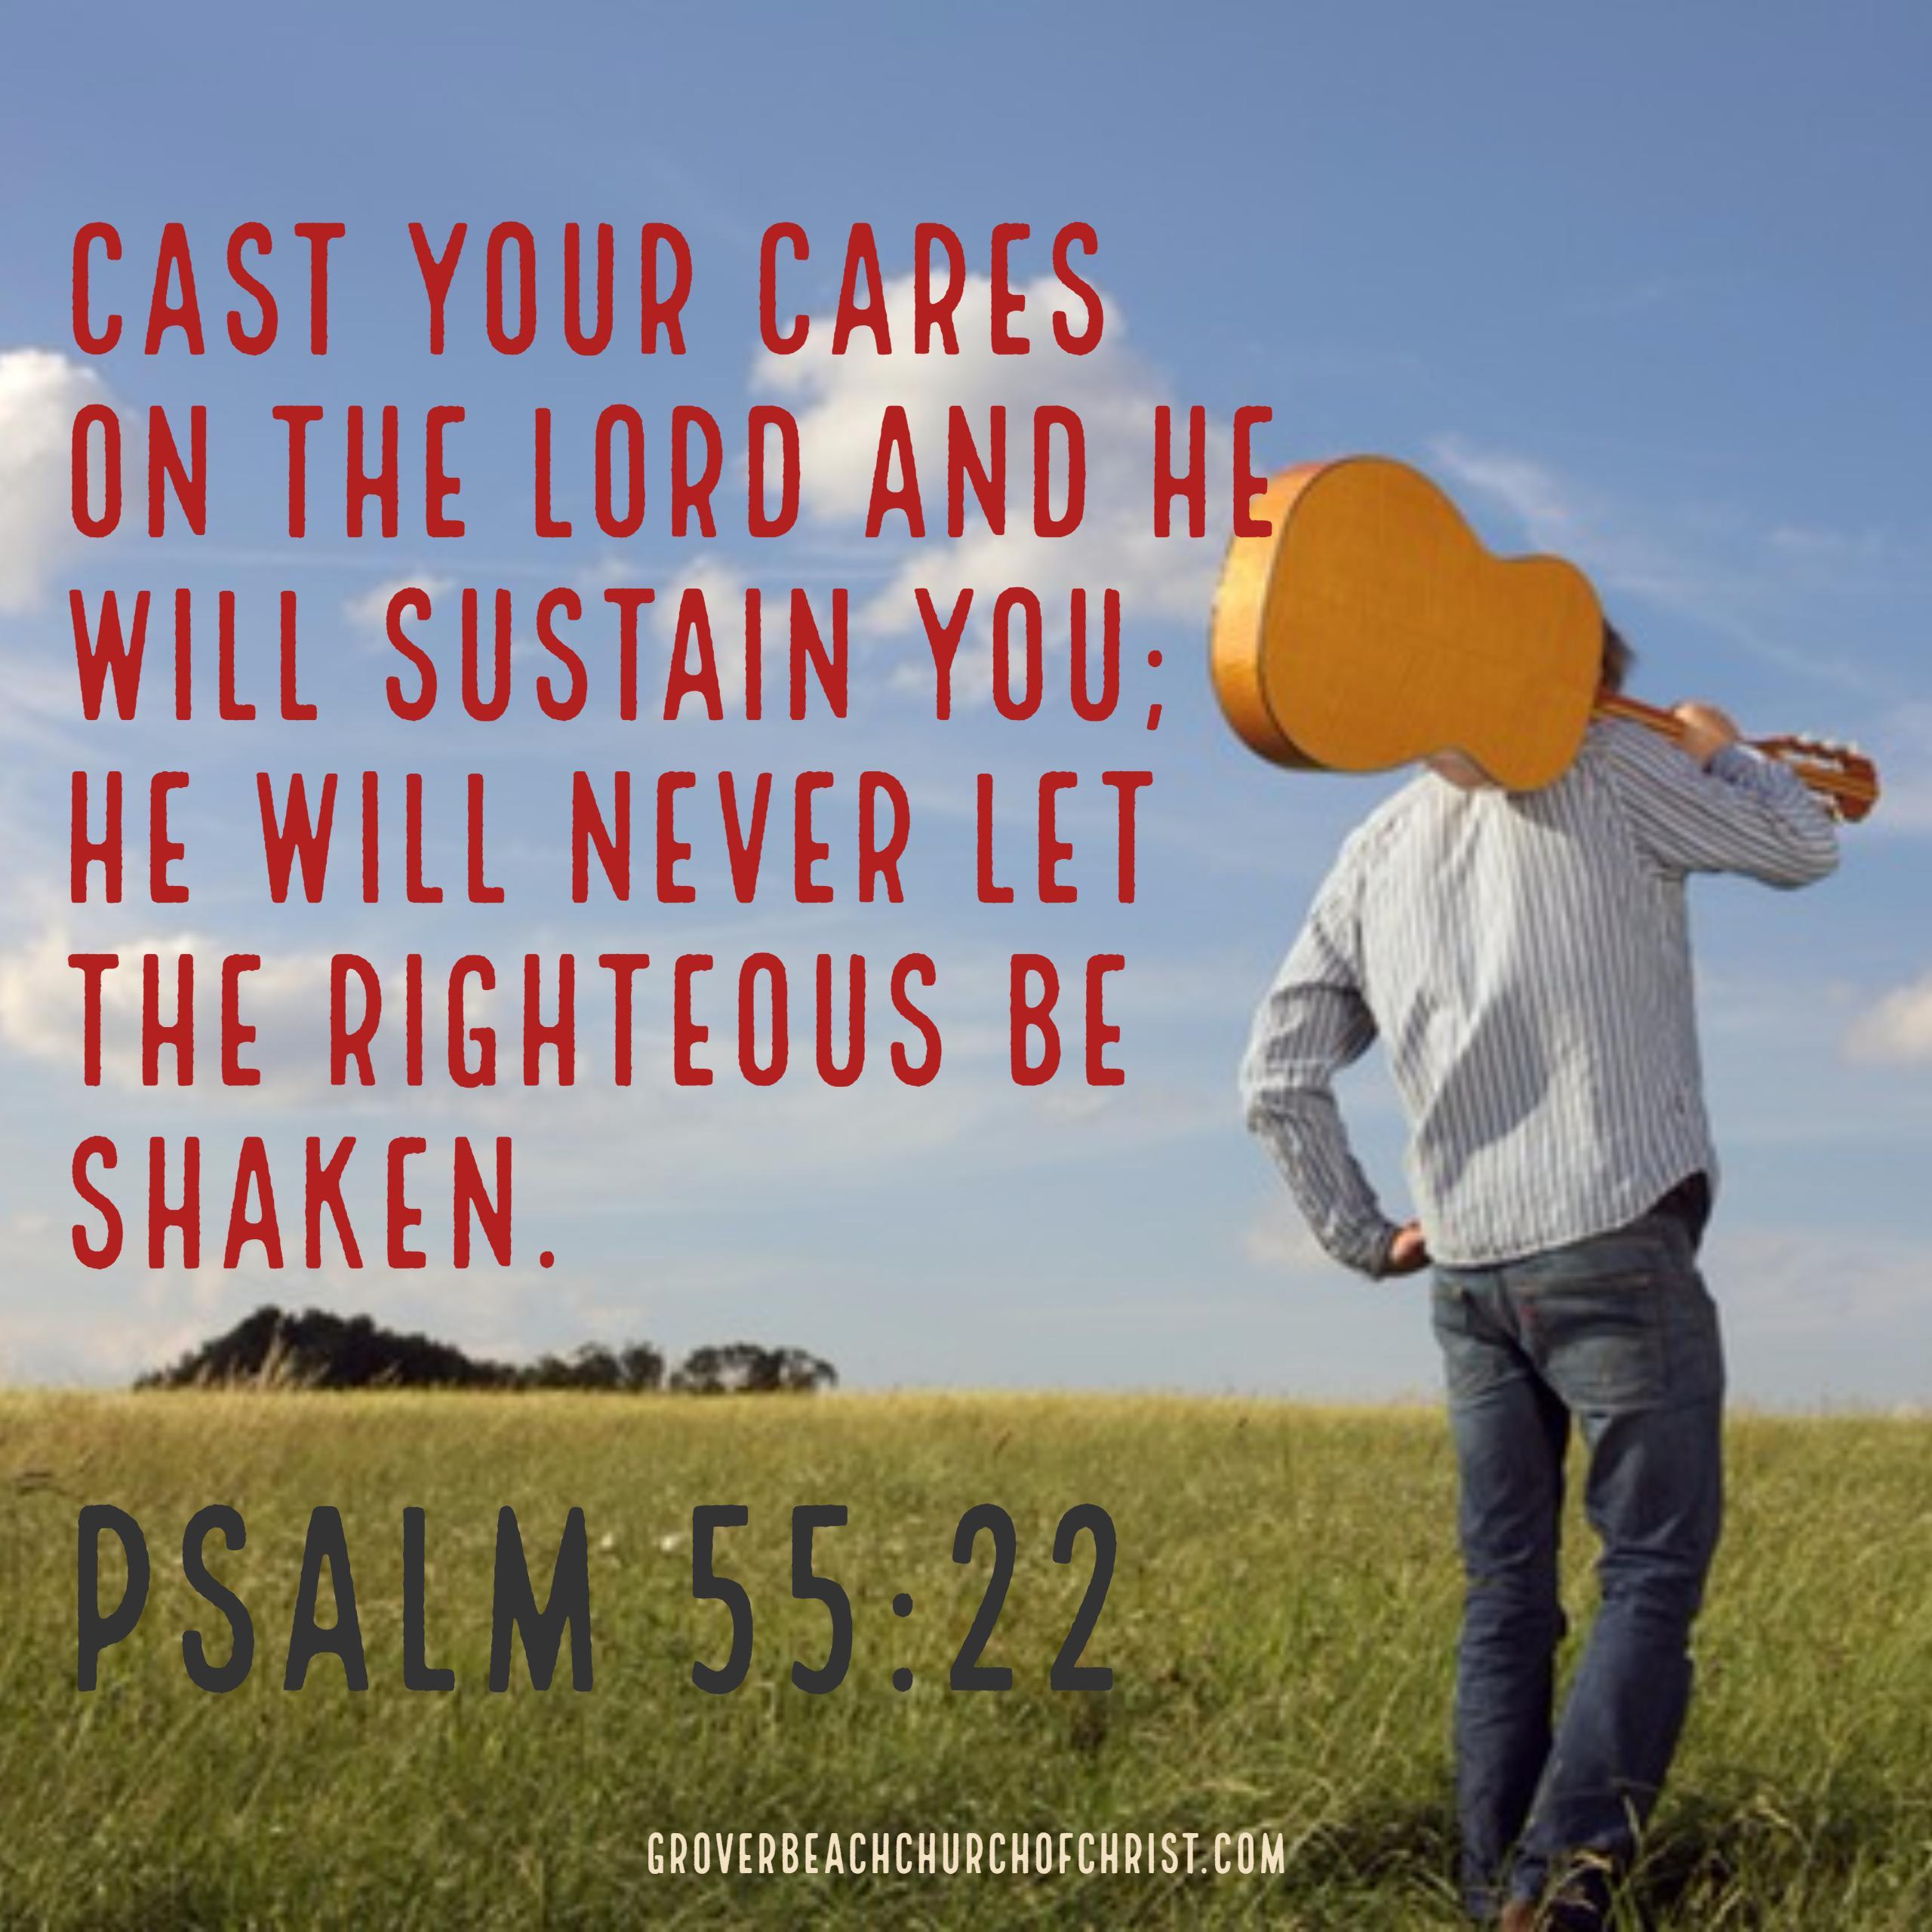 Psalm 55:22 Cast your cares